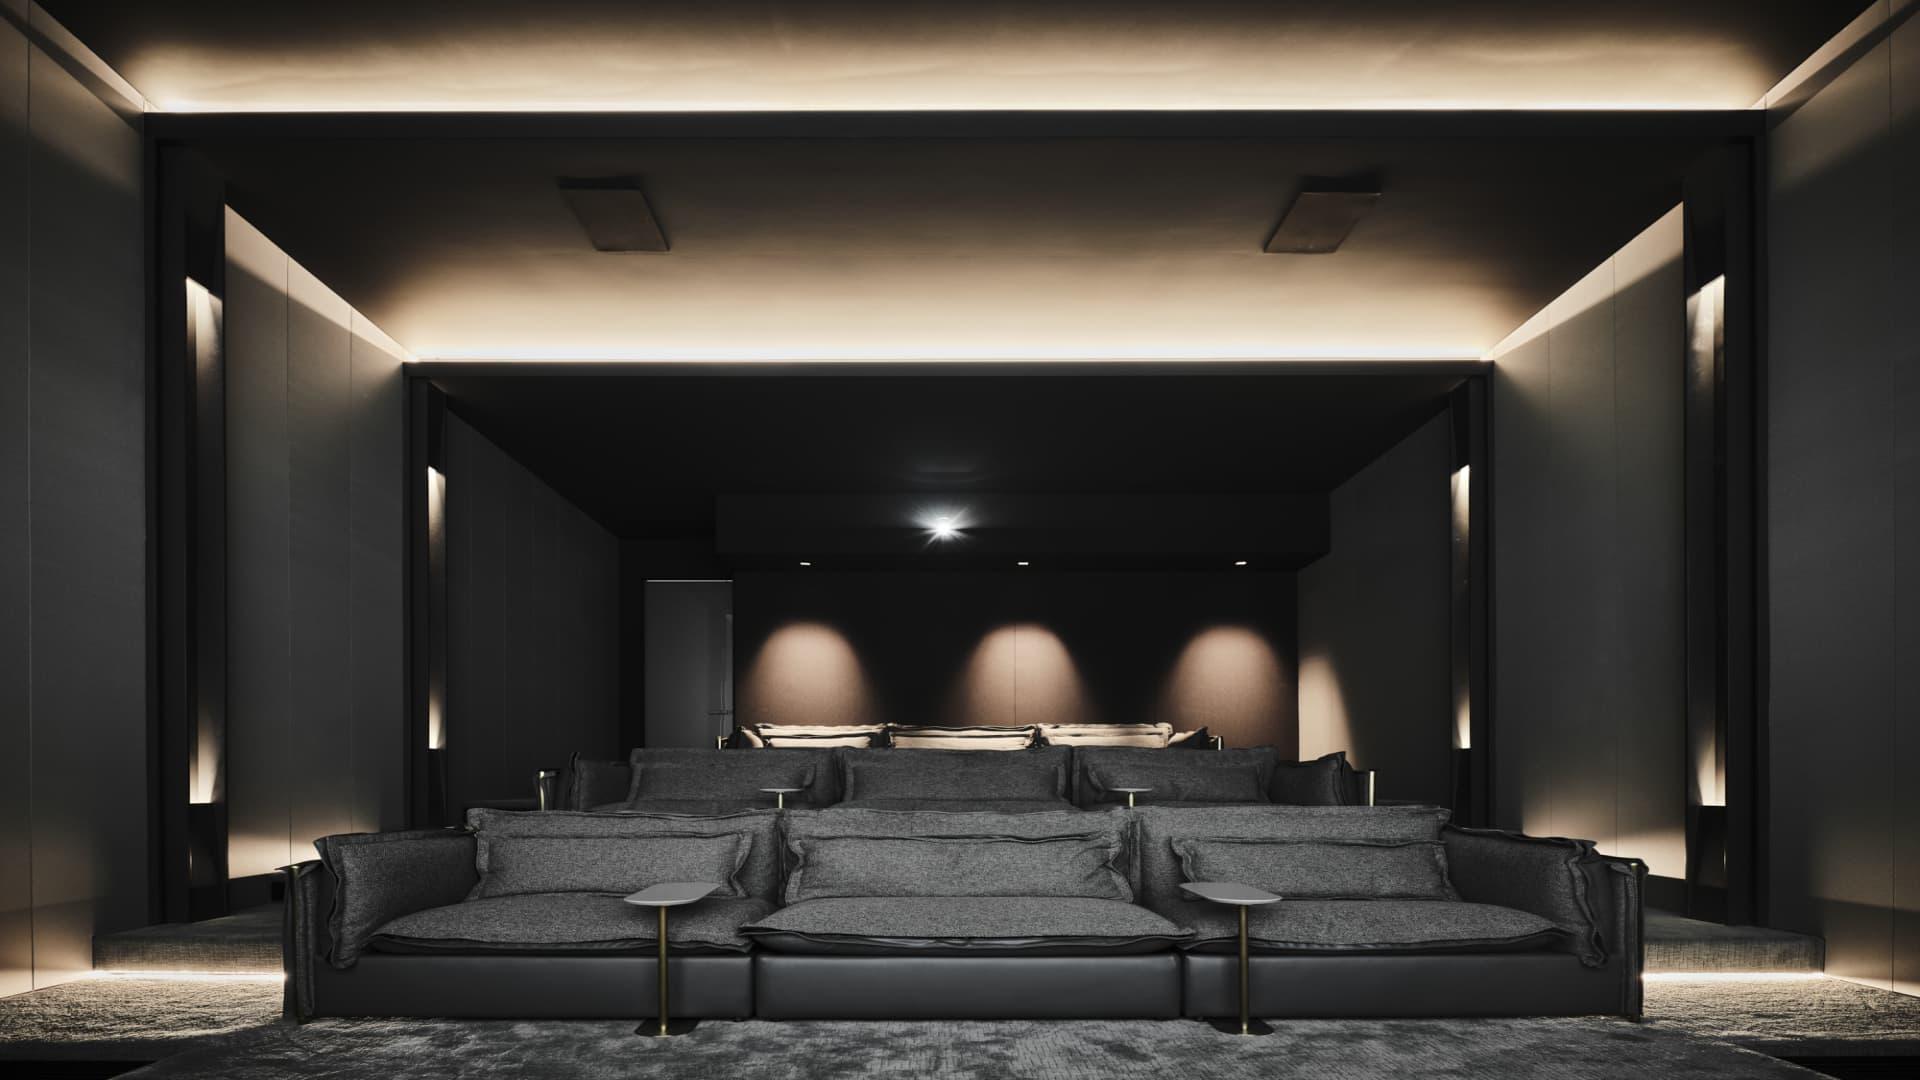 The spacious cinema room.